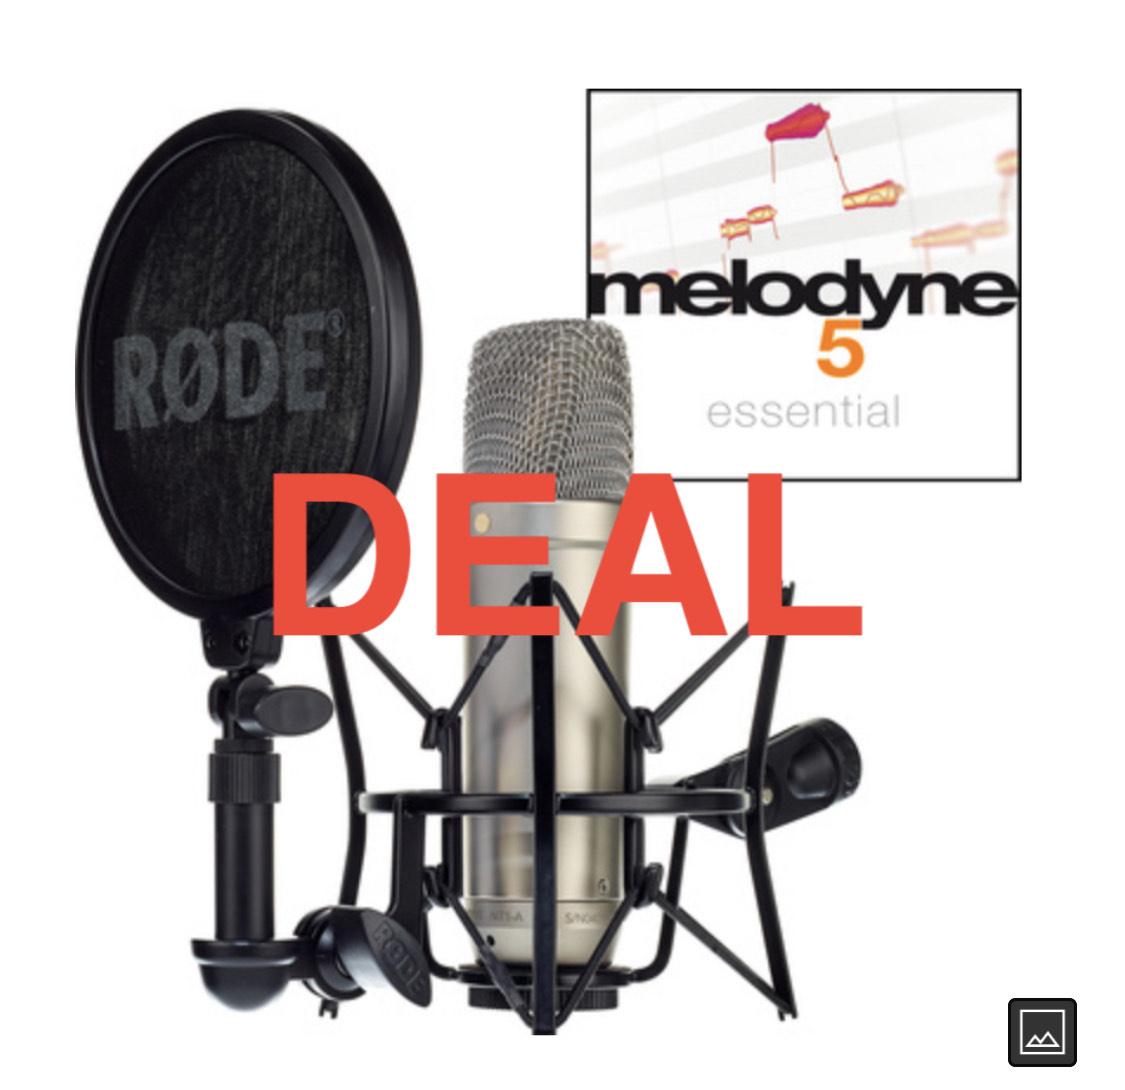 Rode NT1-A Complete Vocal Recording + melodyne 5 essential für 166€!